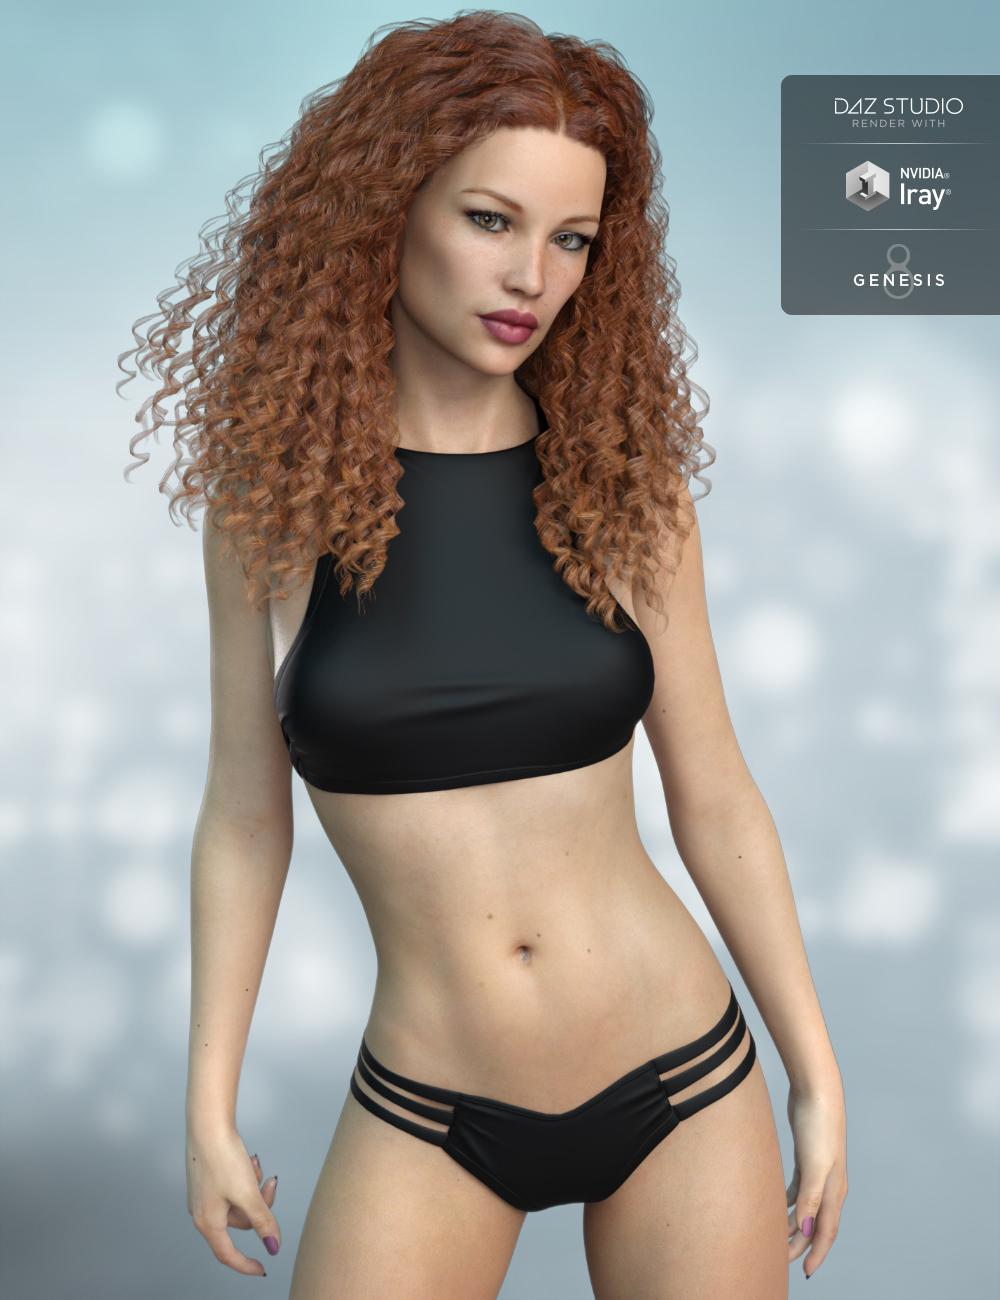 FWSA Rose HD for Victoria 8 by: Fred Winkler ArtSabby, 3D Models by Daz 3D